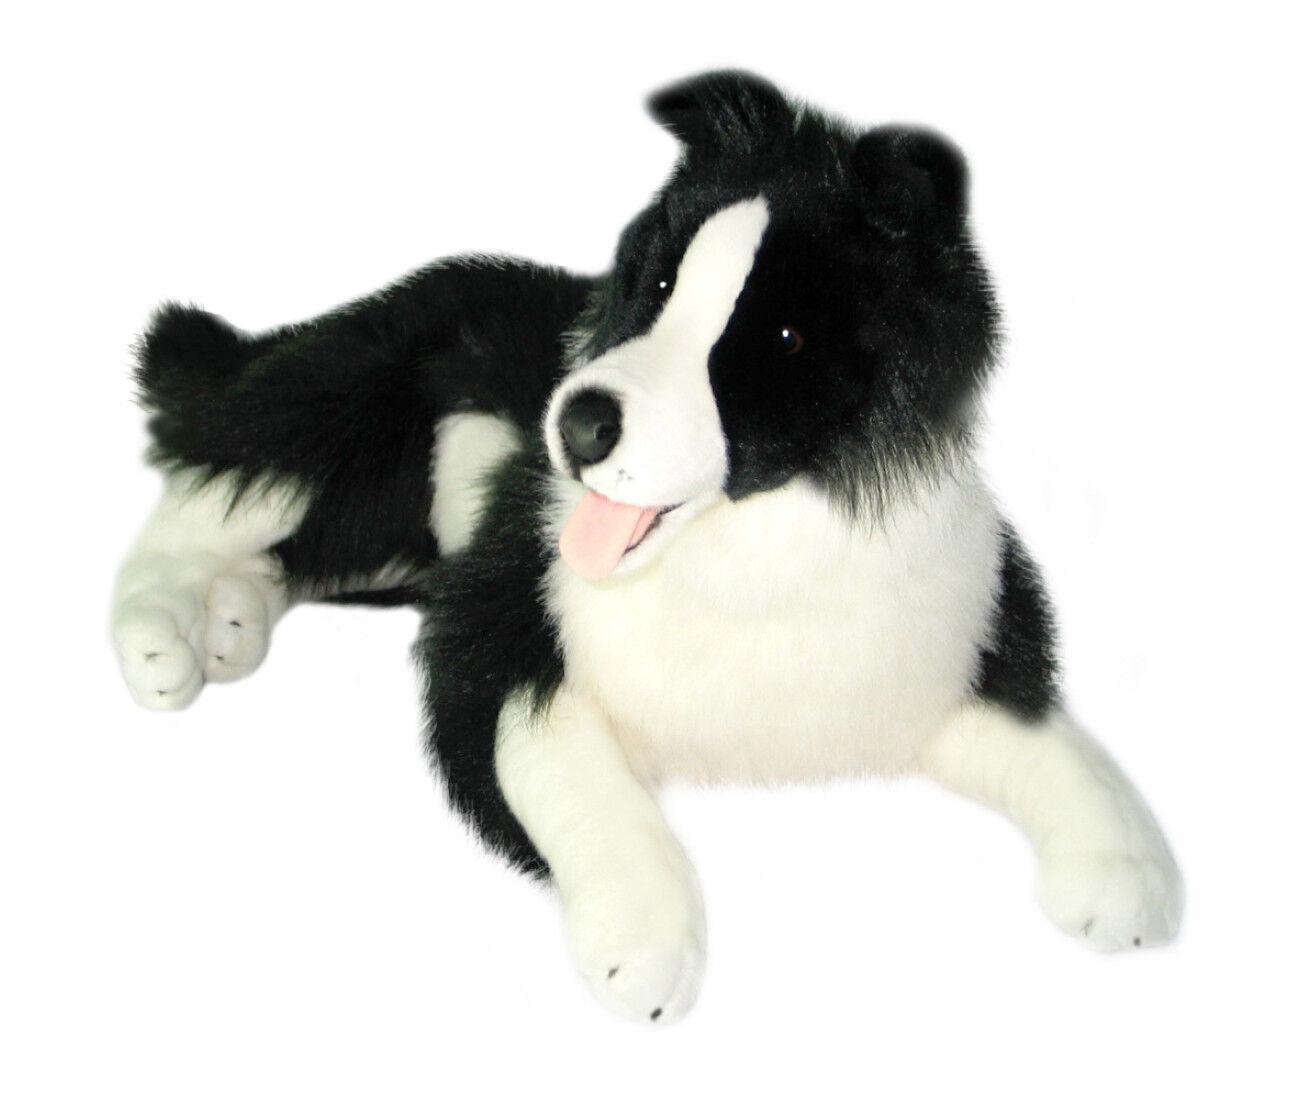 NEW BOCCHETTA - OSCAR LARGE LYING BORDER COLLIE DOG SOFT PLUSH TOY 62cm